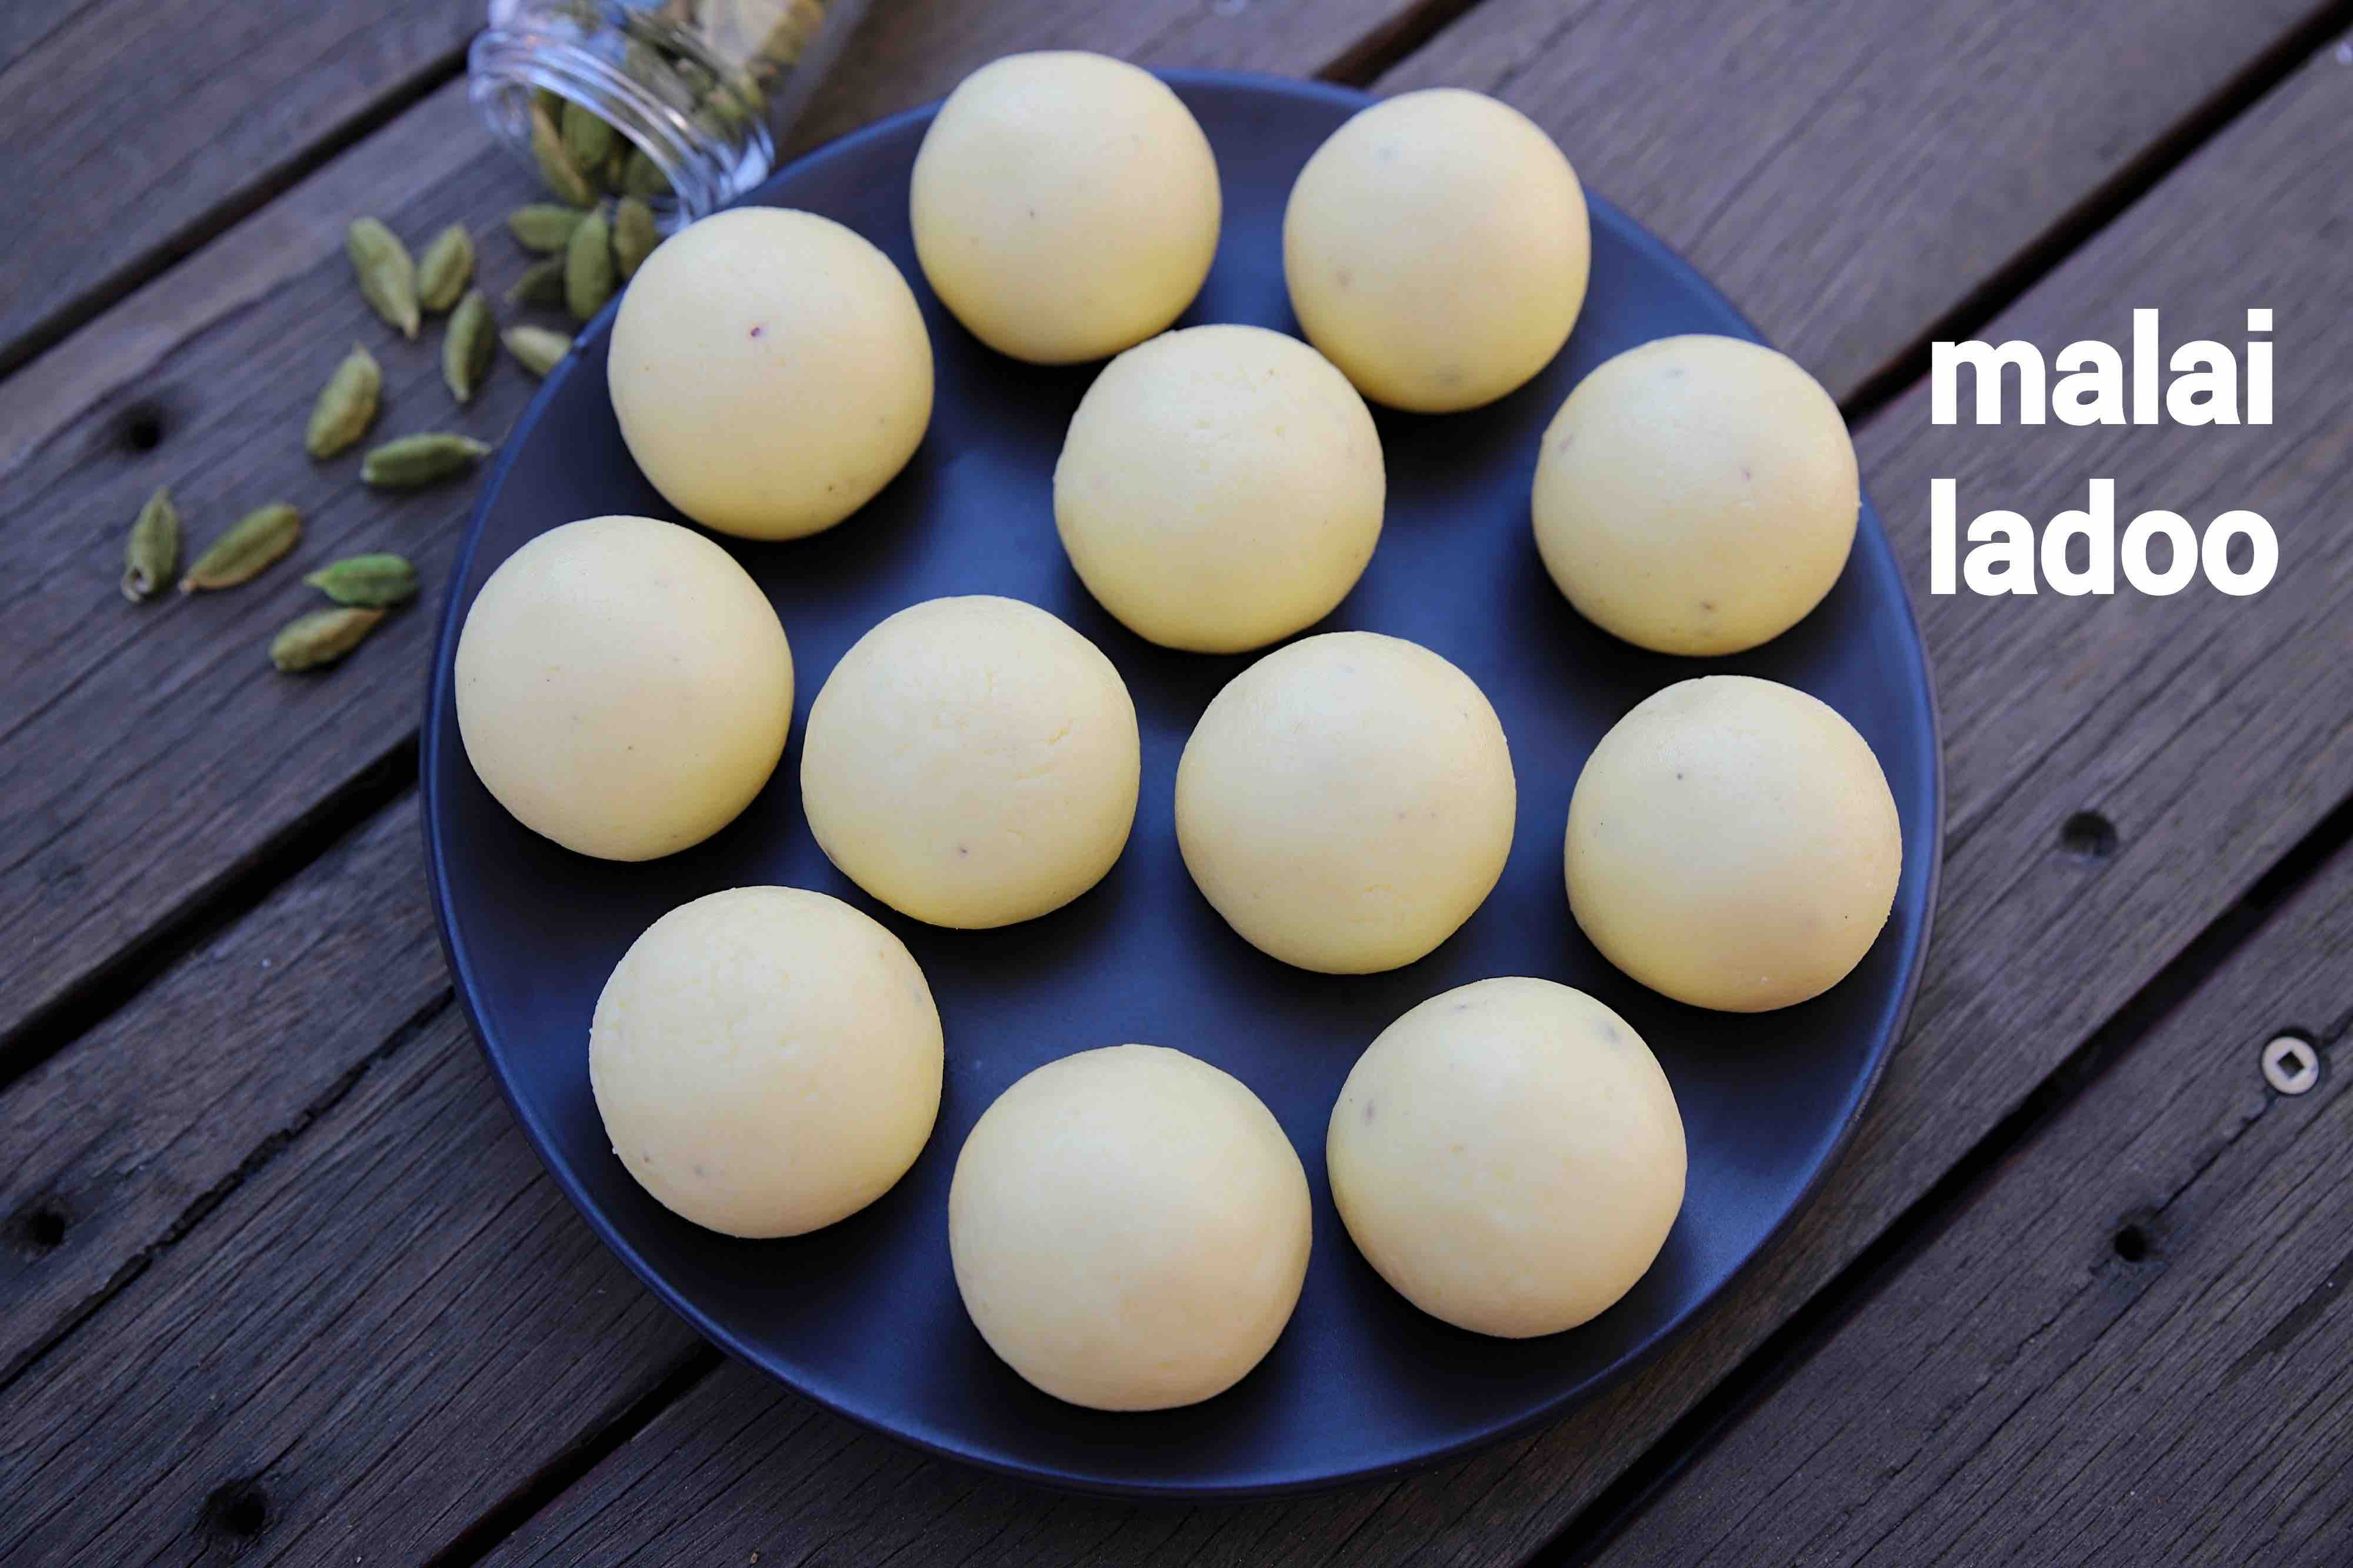 malai ladoo recipe | malai laddu | milk ladoo | paneer ladoo